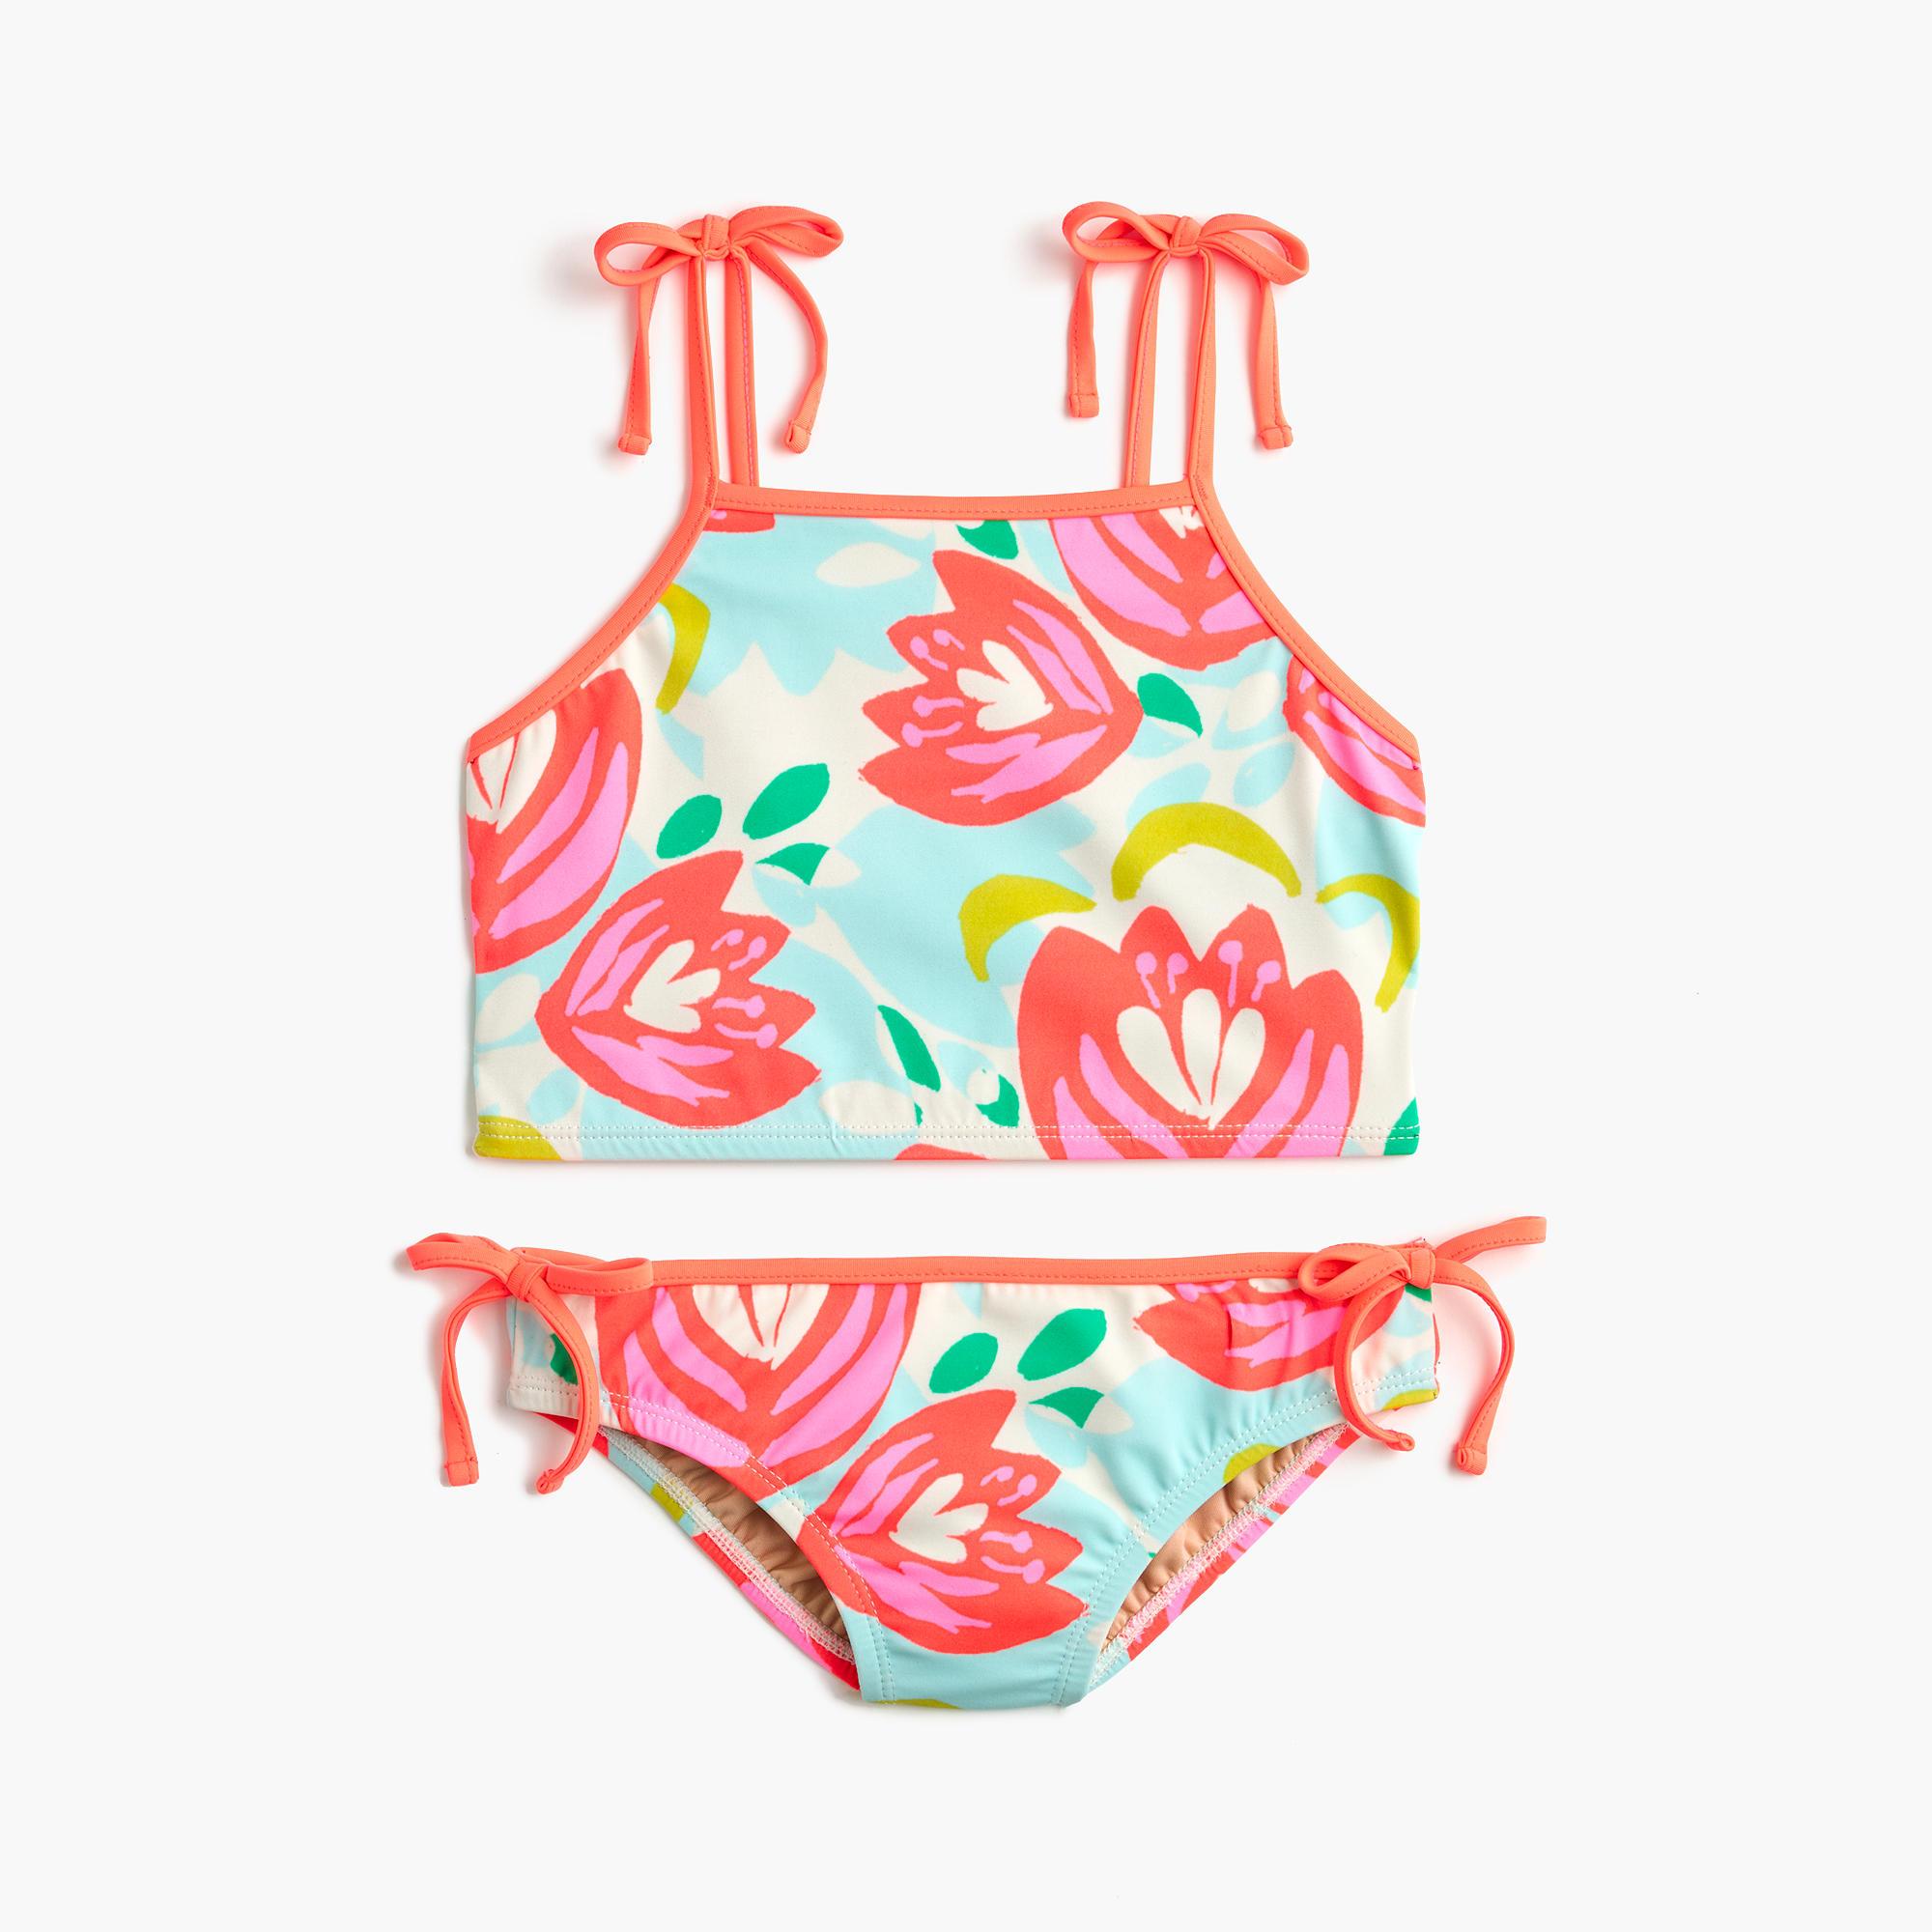 G5005_KA0194?$pdp_enlarge$ girls' swimwear swim suits, bikinis & more j crew,7 Elephant Swimwear